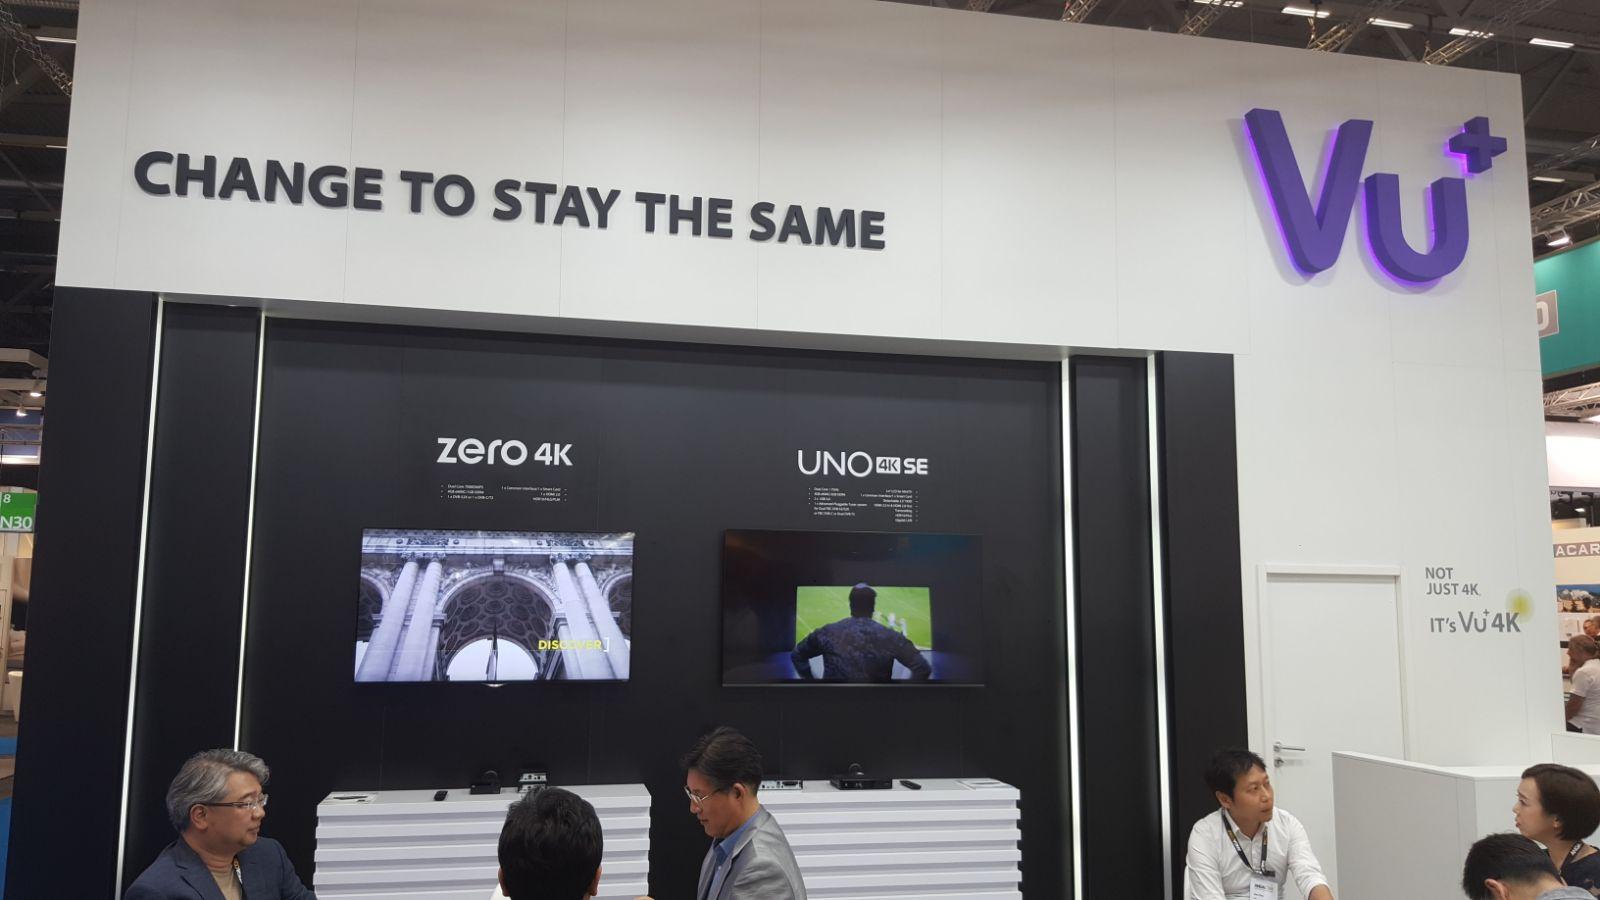 Novedades Stand Vu+: Vu+ Uno 4k se y Vu+ Zero 4k